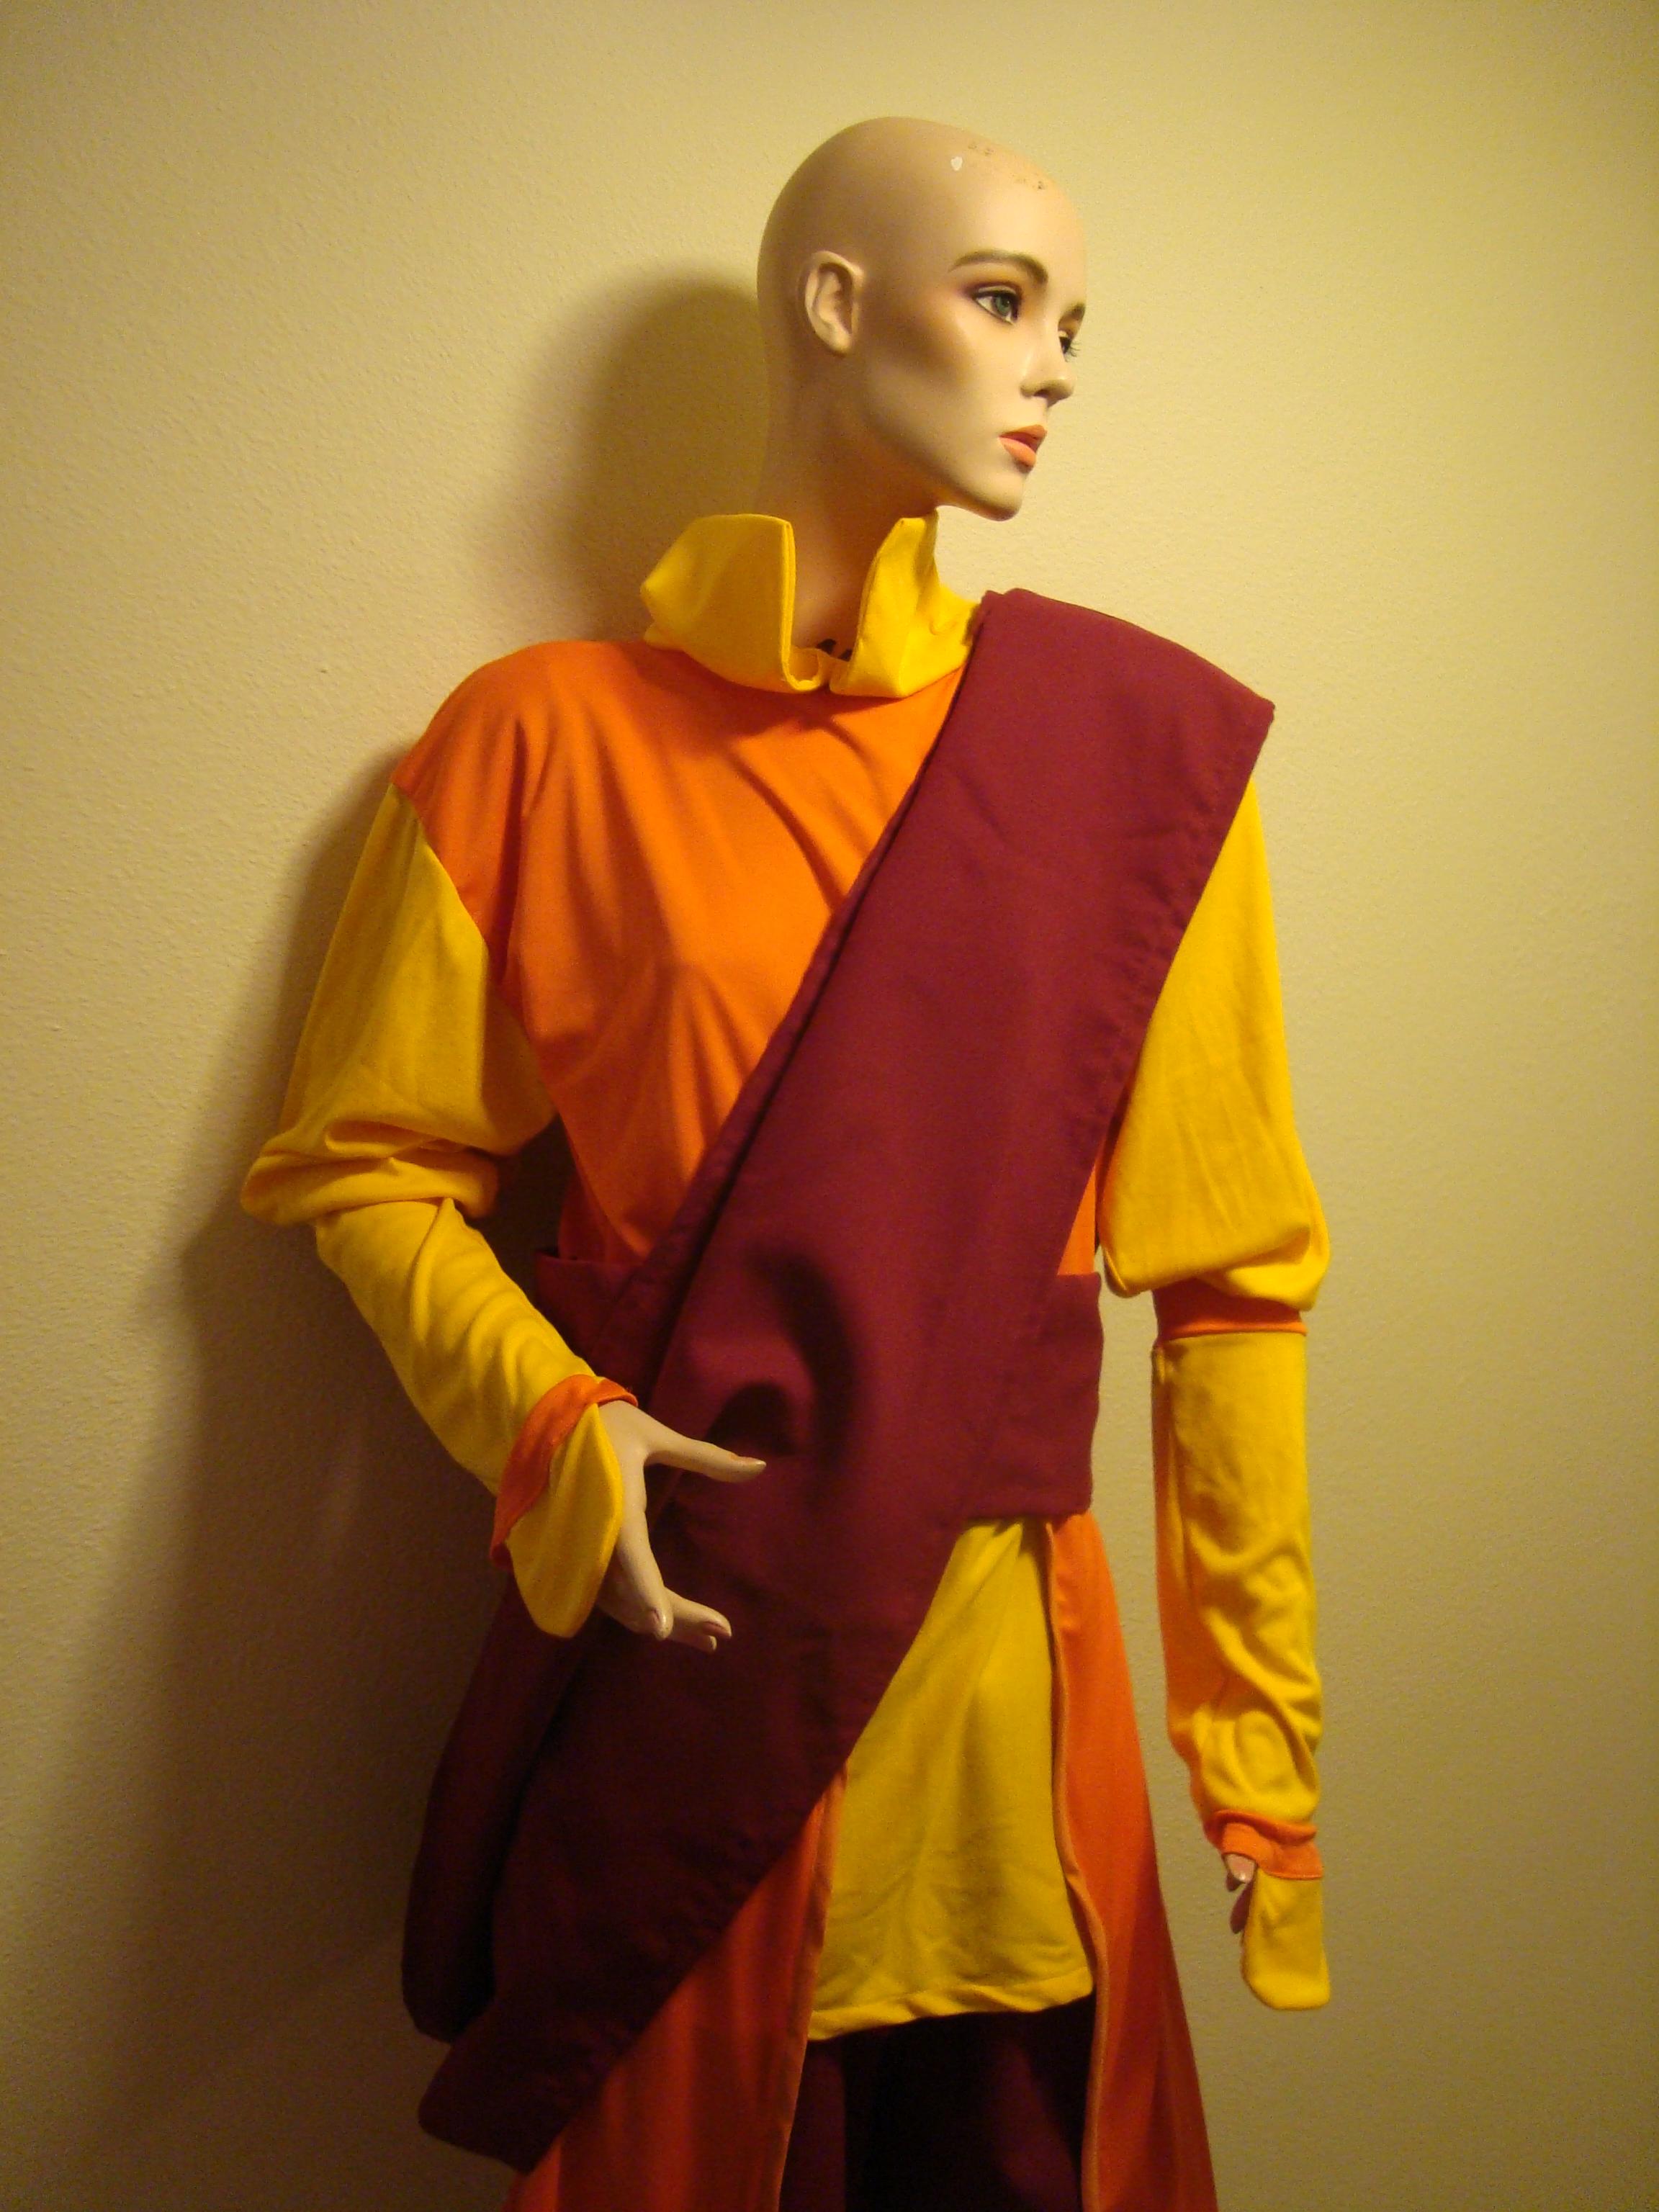 Adult Aang, Avatar Costume | … | Flickr - Photo Sharing!: https://flickr.com/photos/99717704@n05/9440579769